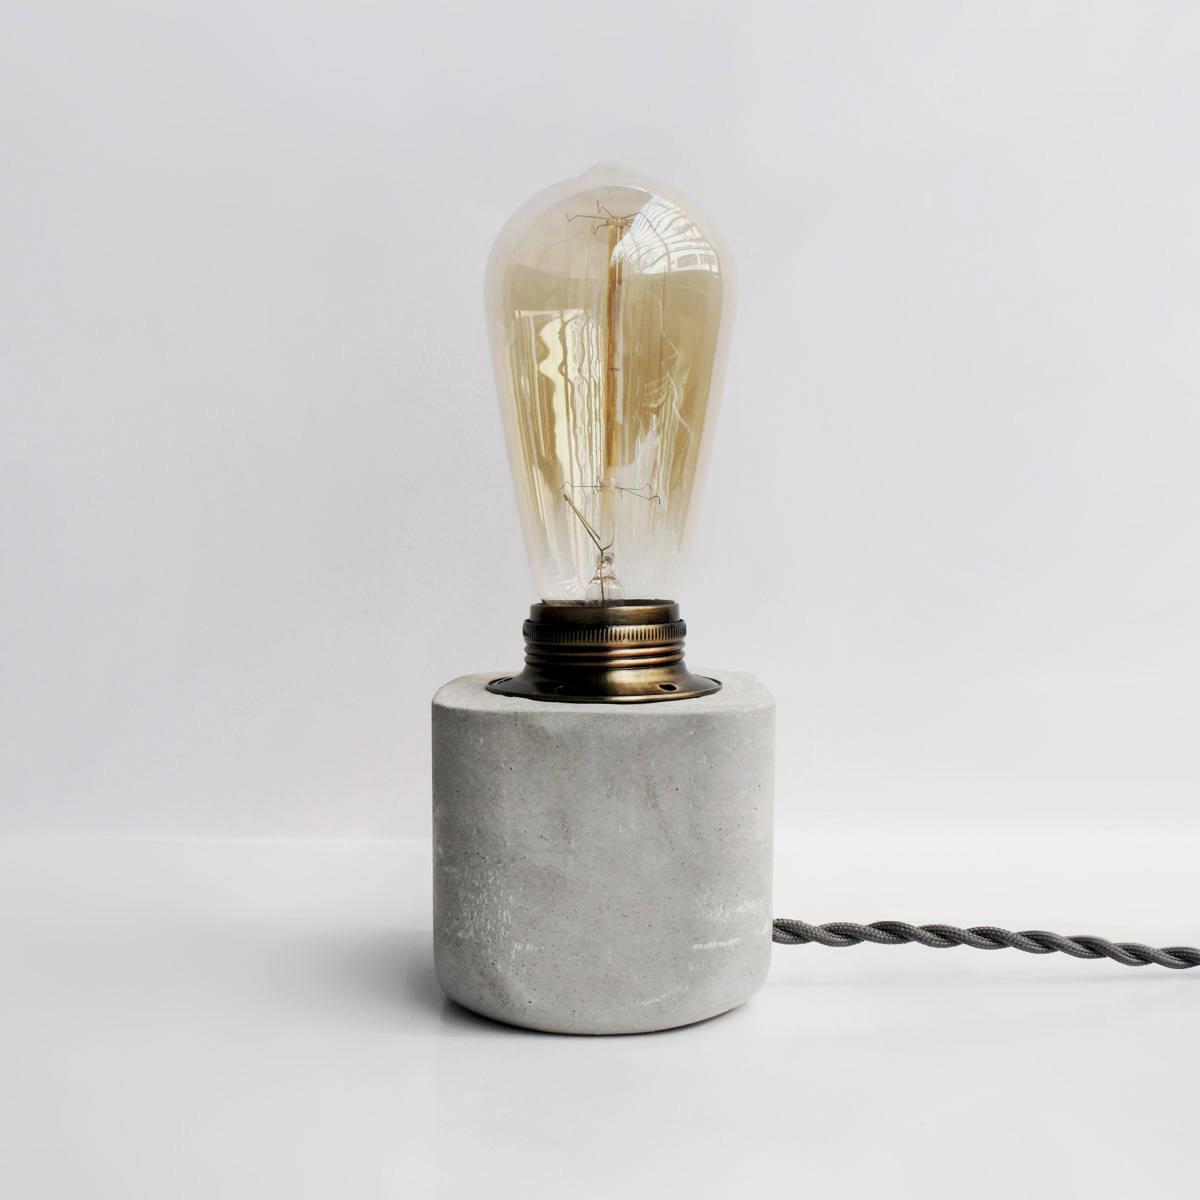 HALF 半嵌古銅圓角設計水泥燈 / Copper concrete lamp